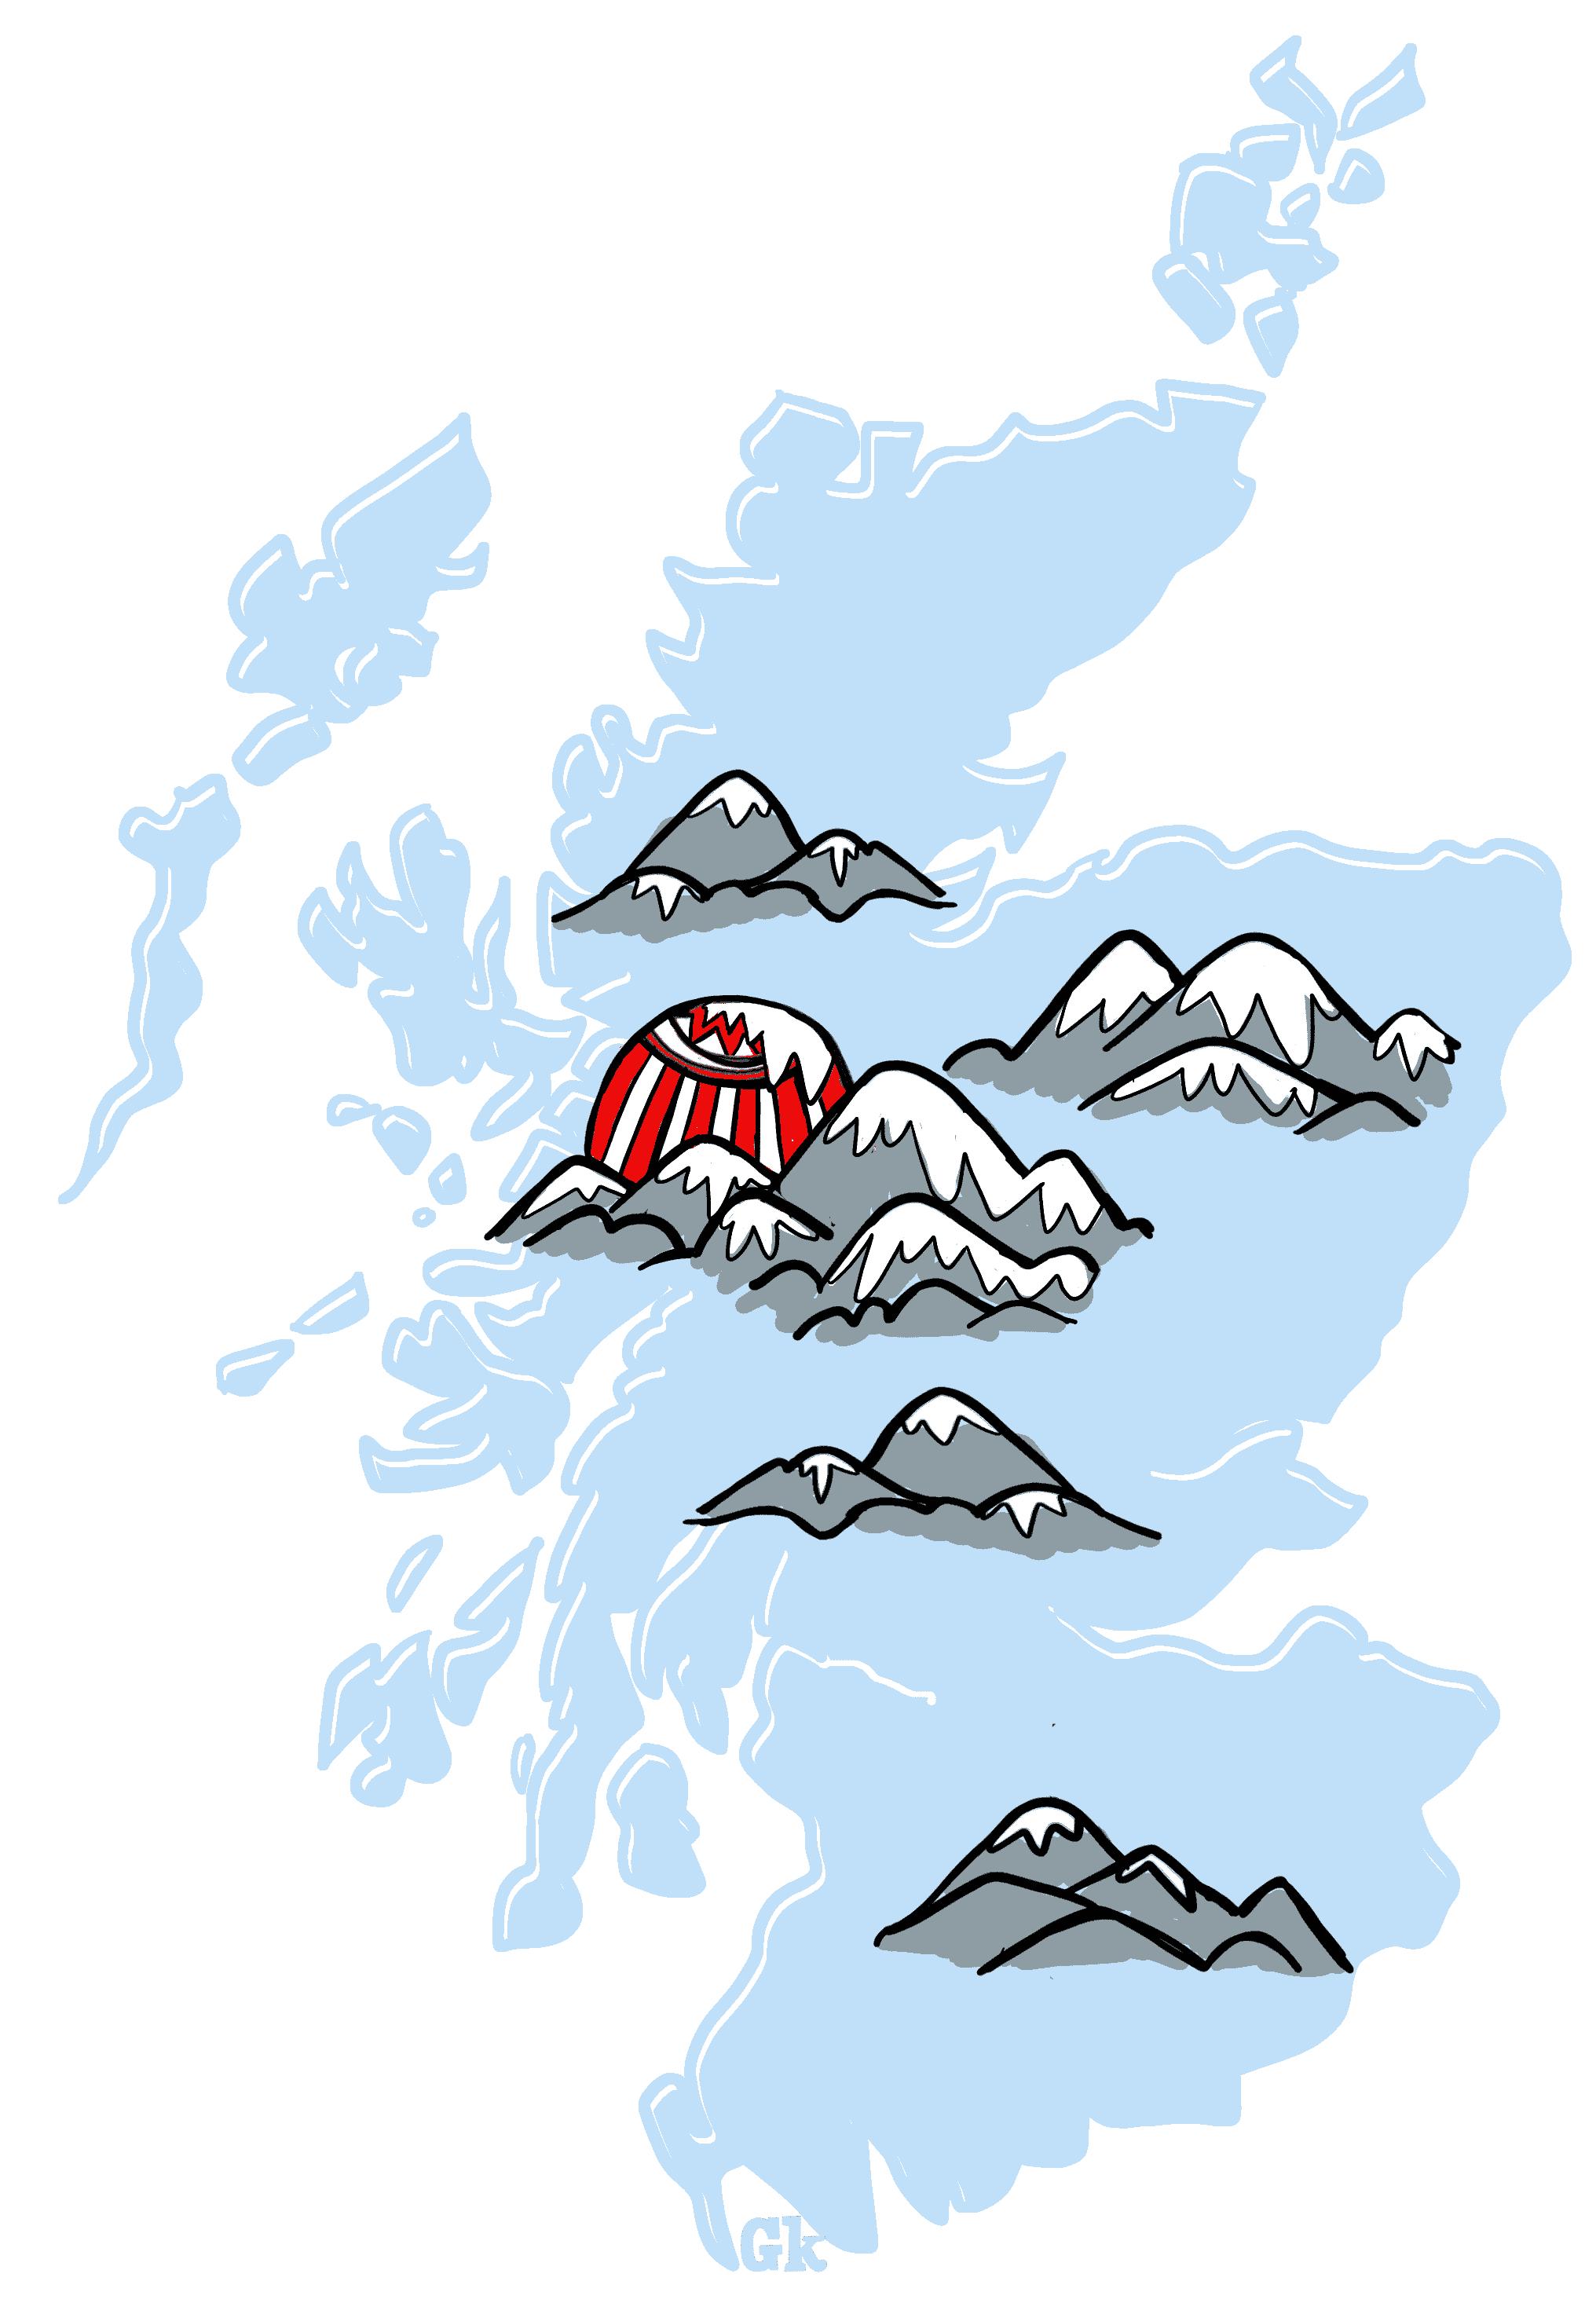 Scottish mountains map of Scotland